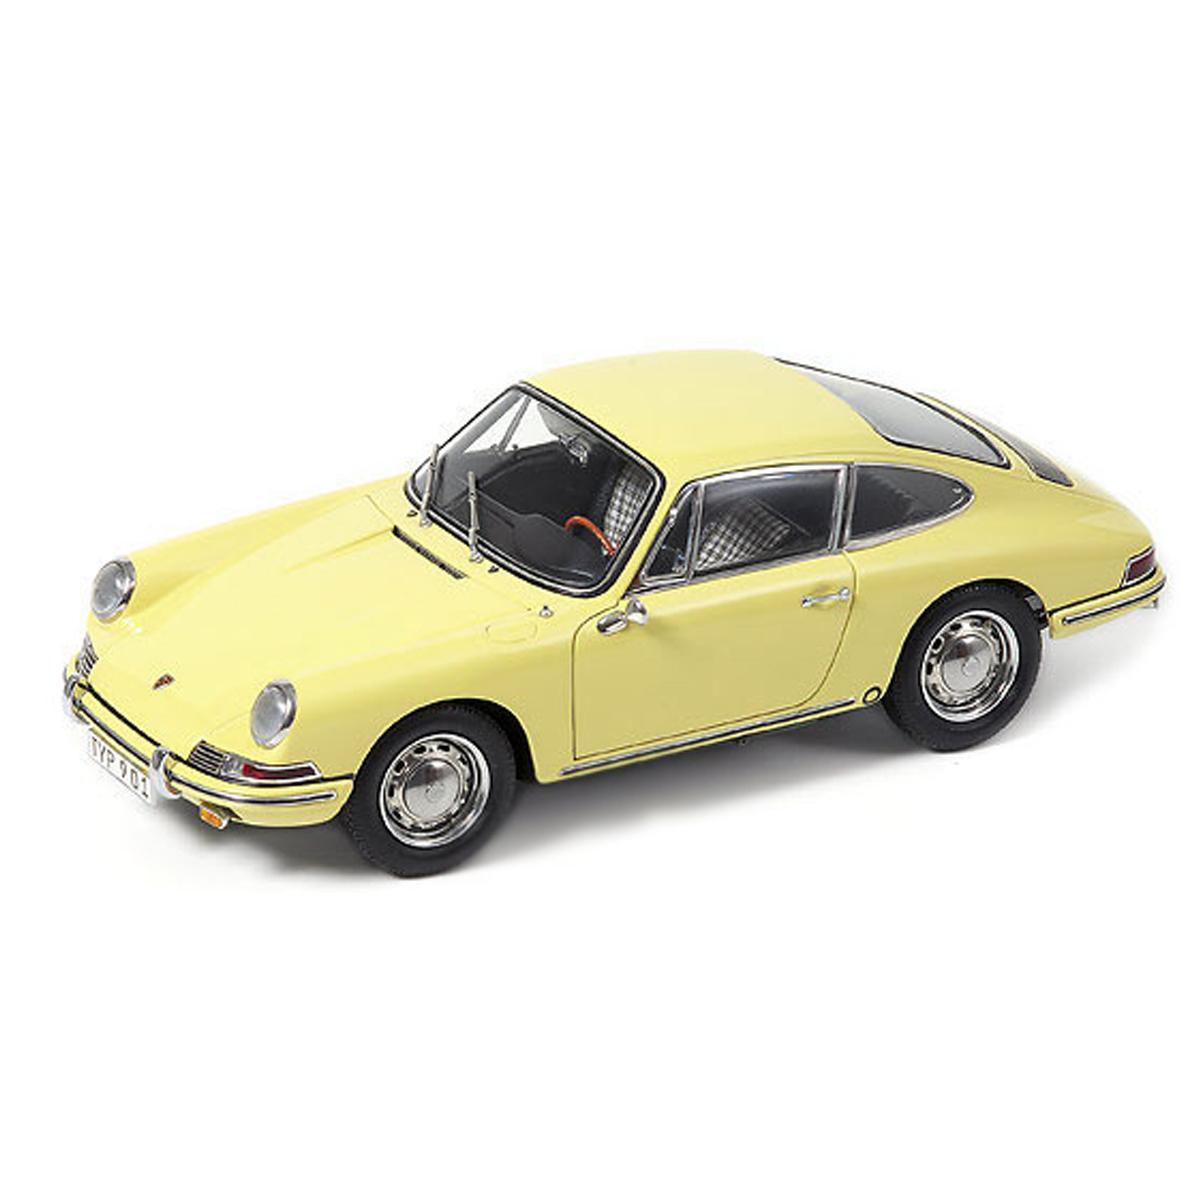 Porsche 901, 1964 Champaign Yellow